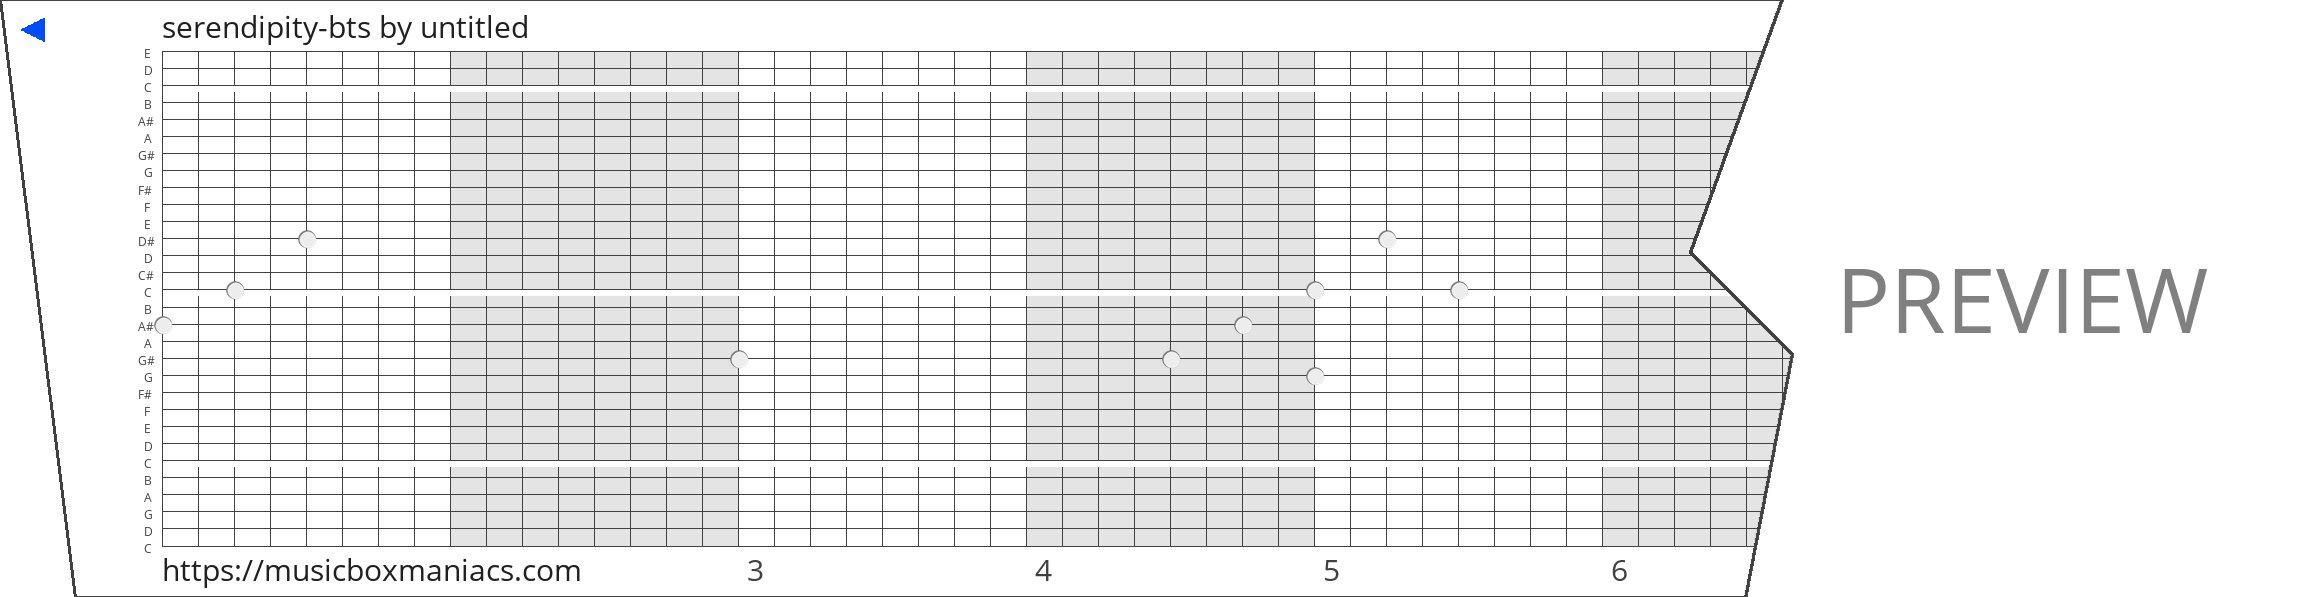 serendipity-bts 30 note music box paper strip